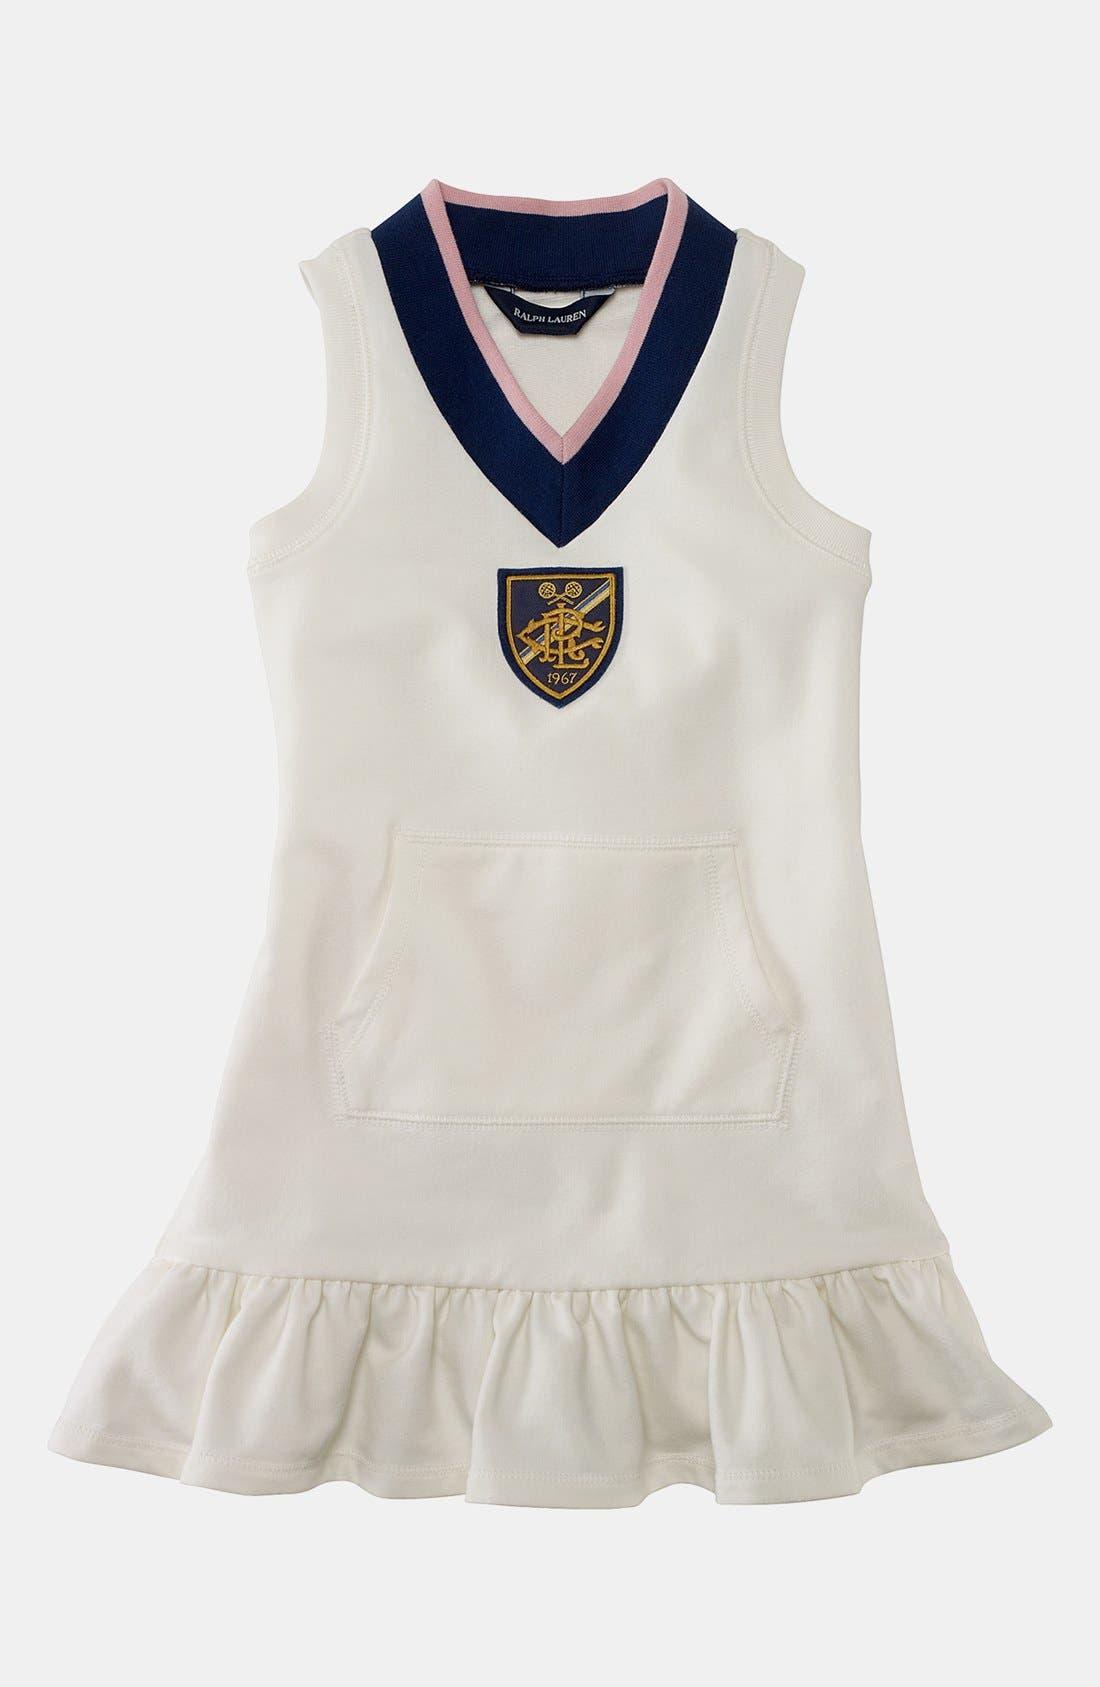 Main Image - Ralph Lauren Dress (Toddler)